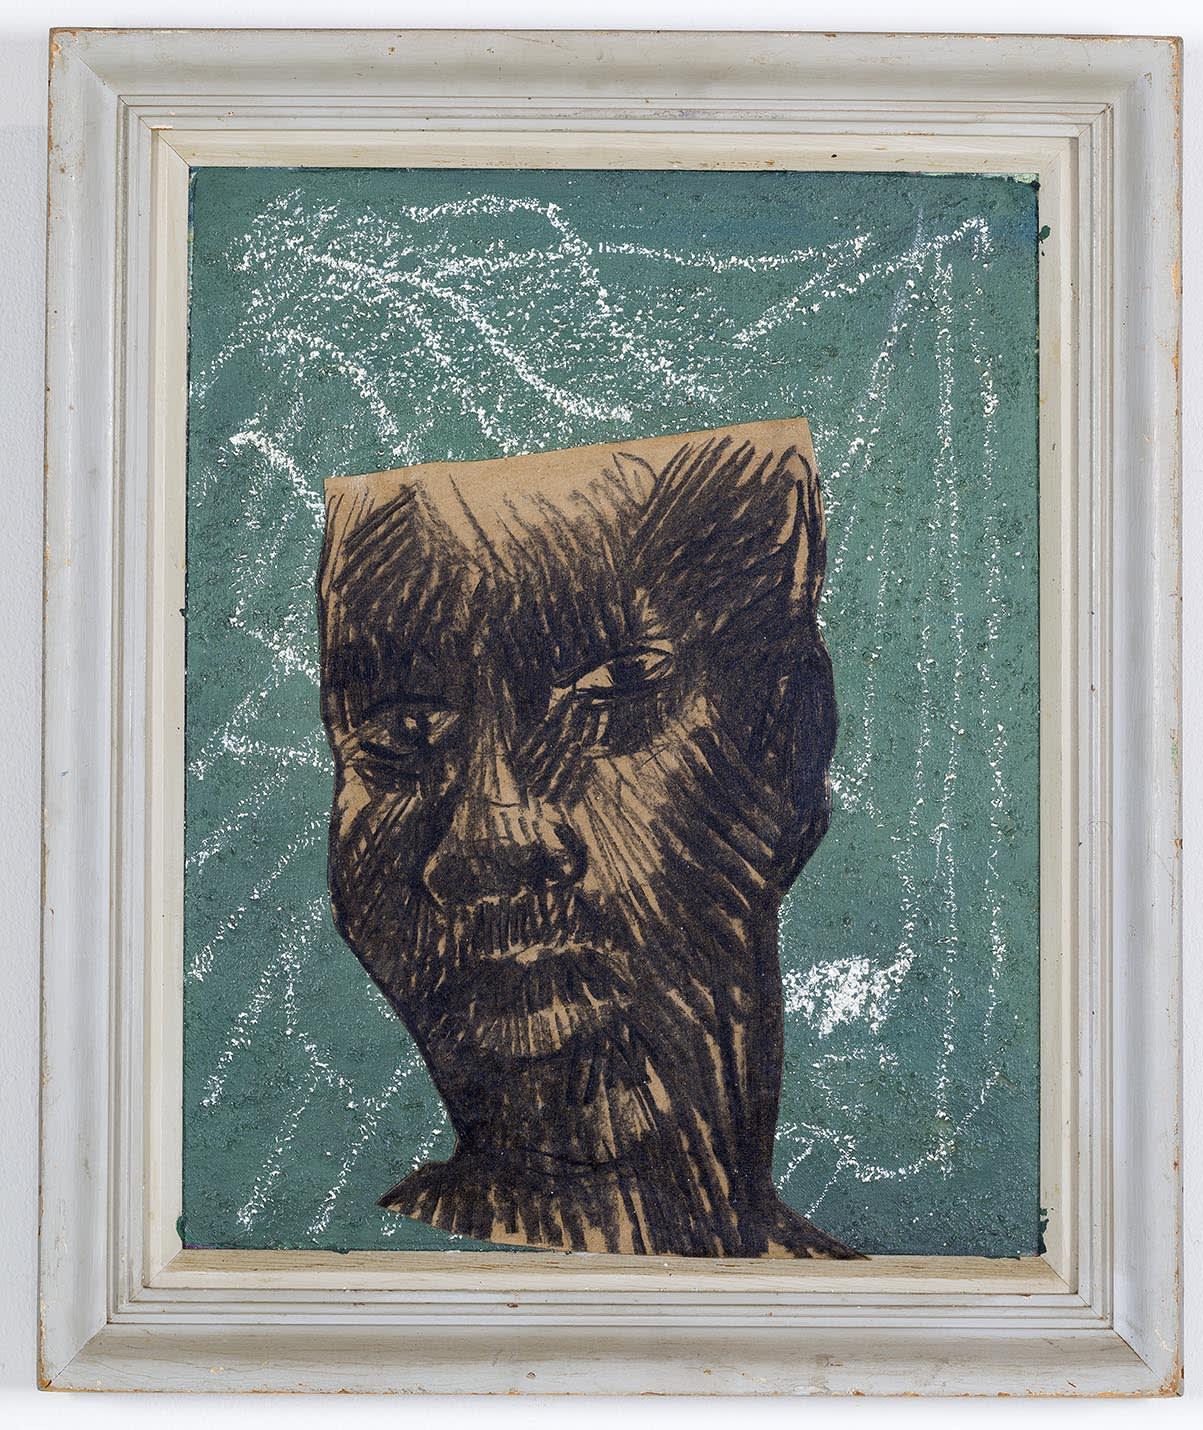 Ronald Muchatuta, Brown face I, 2020